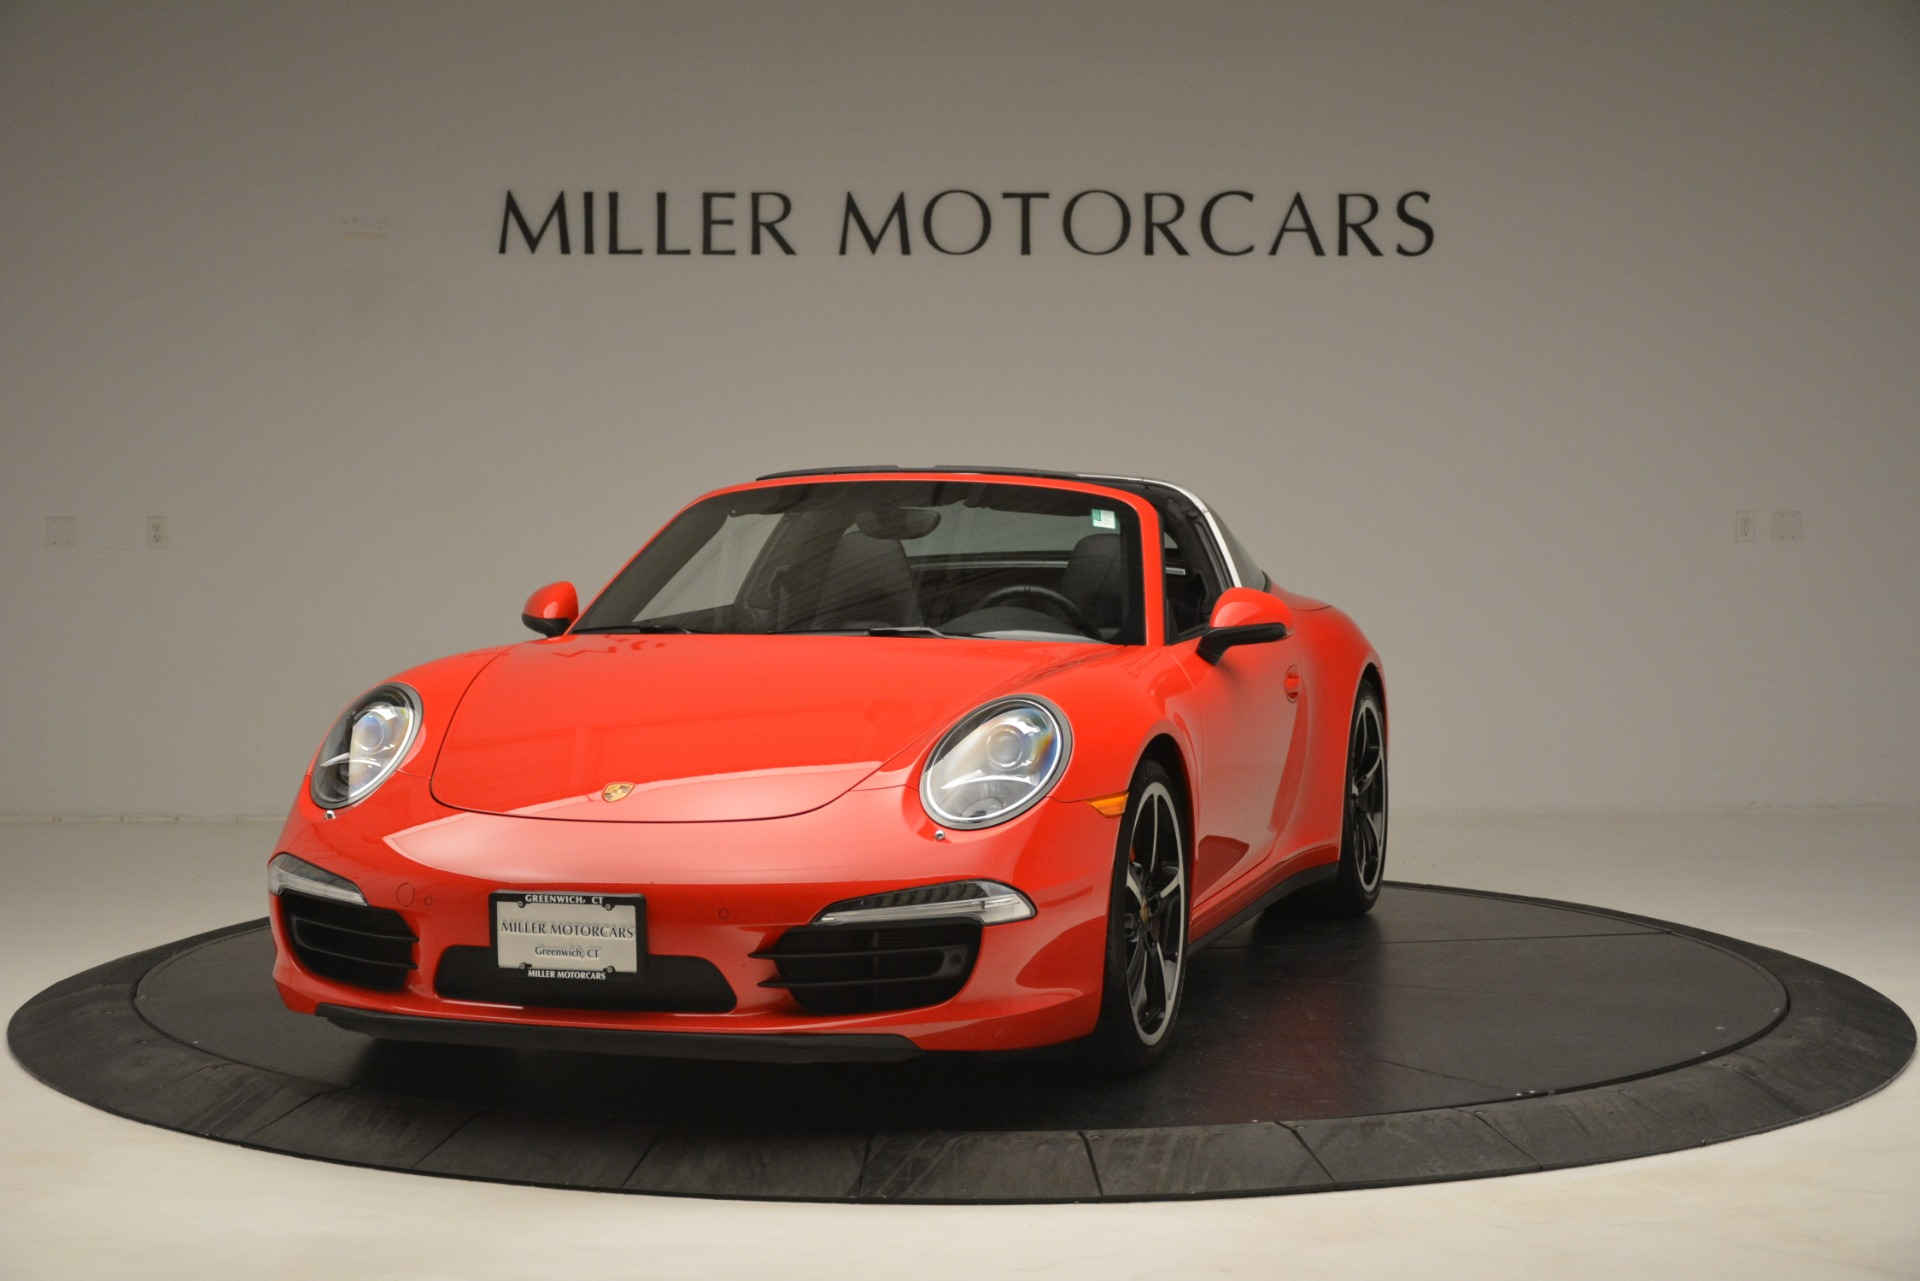 Used 2016 Porsche 911 Targa 4S for sale Sold at Maserati of Westport in Westport CT 06880 1